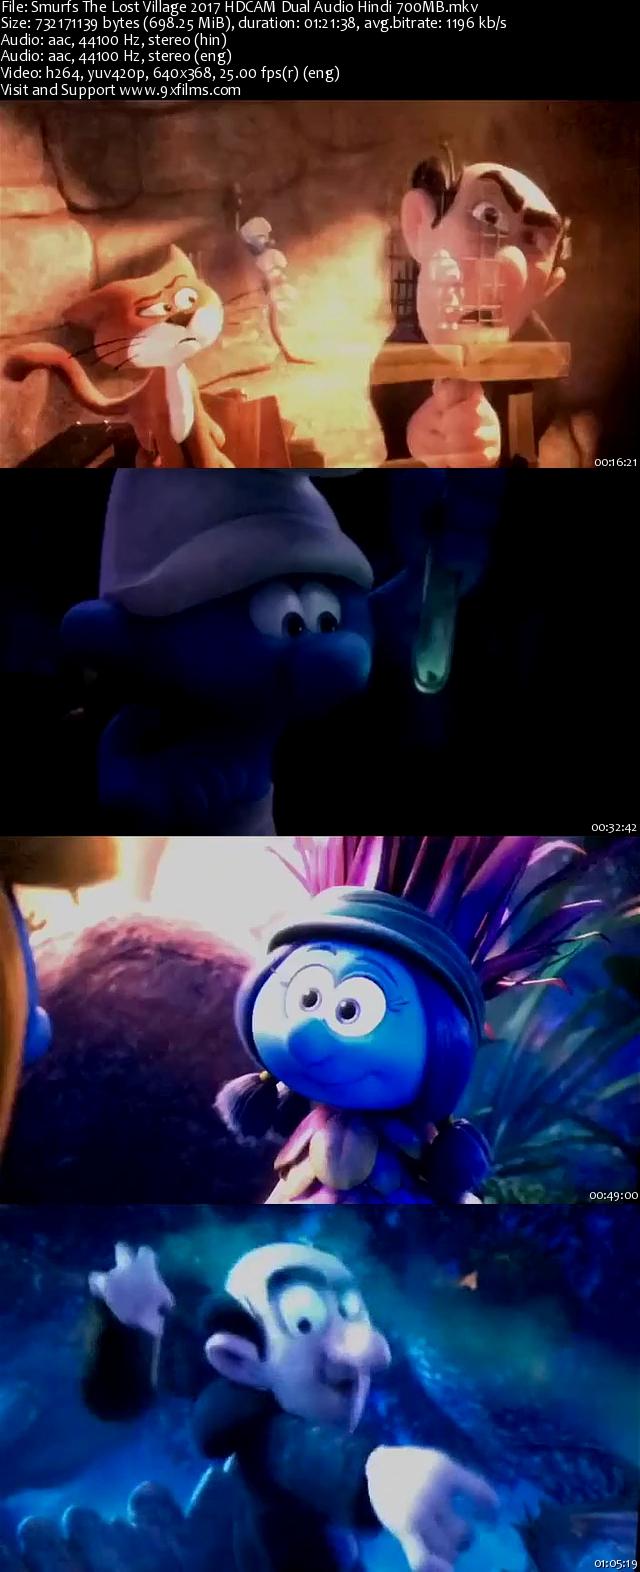 Smurfs The Lost Village 2017 HDCAM Dual Audio Hindi 700MB